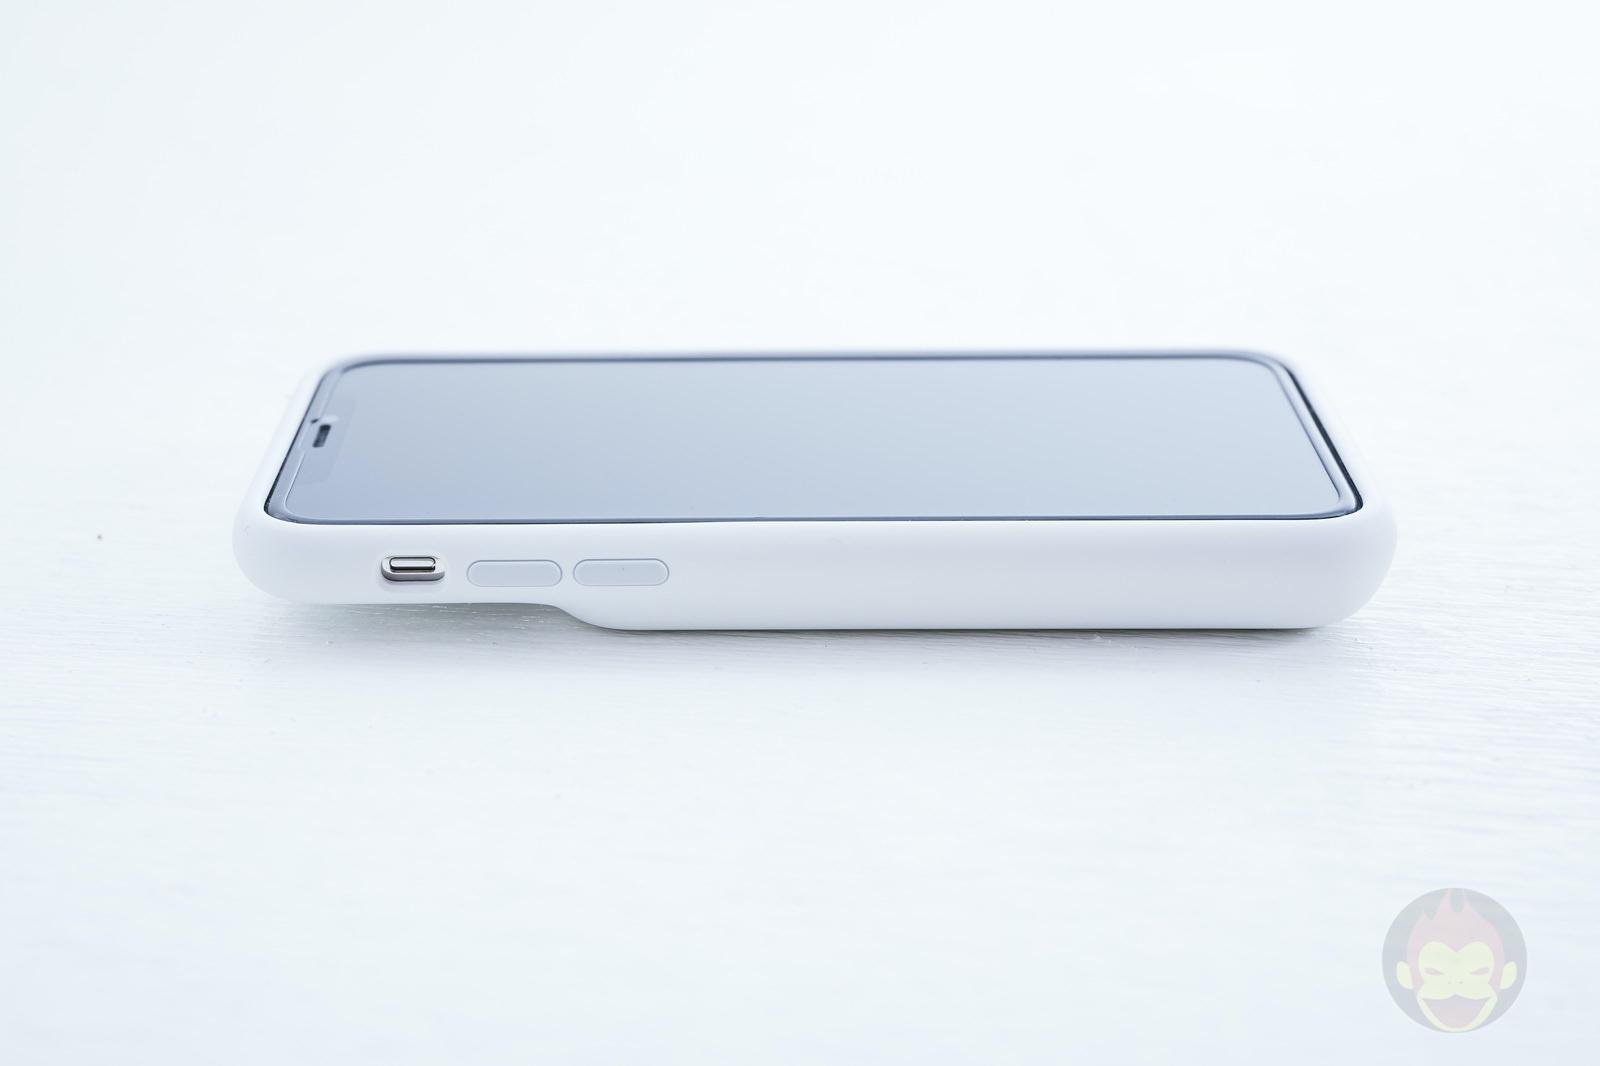 Smart-Battery-Case-for-iPhoneXS-Review-05.jpg